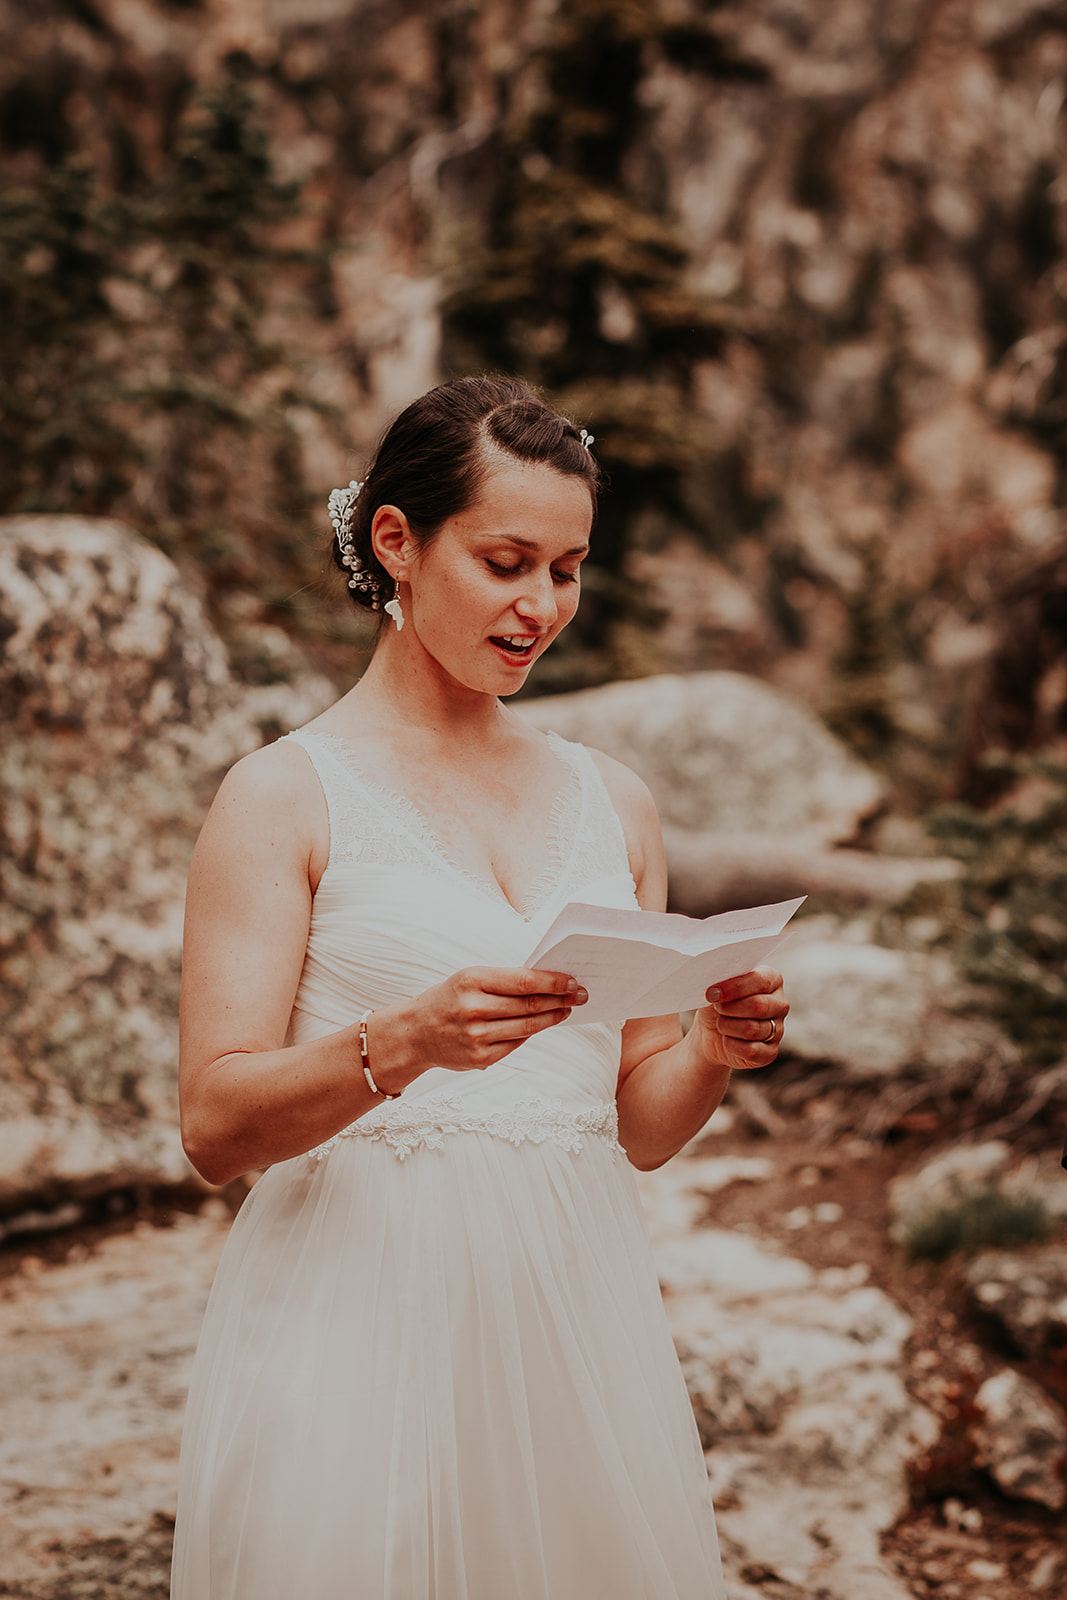 winthrop-wedding-photographer-megan-gallagher-photography (21).jpg